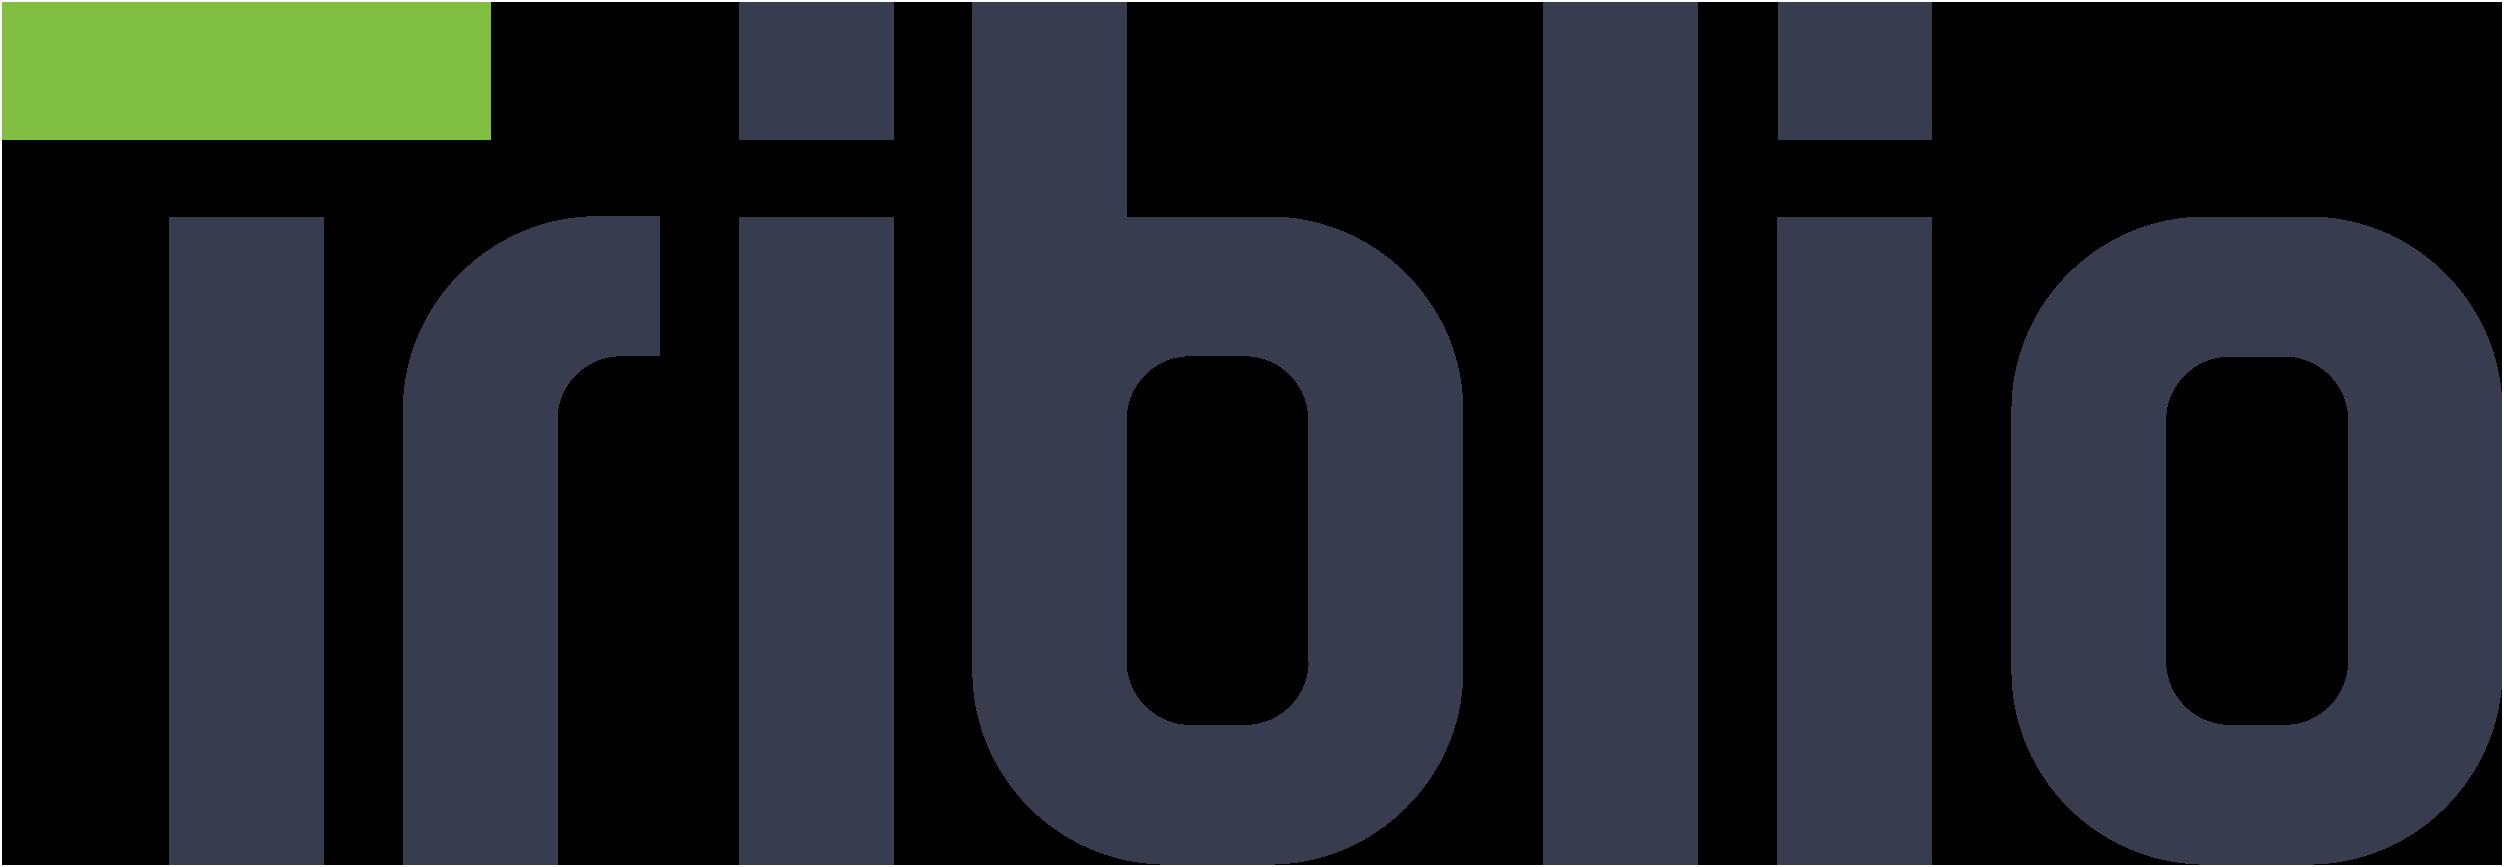 bii19_triblio_logo